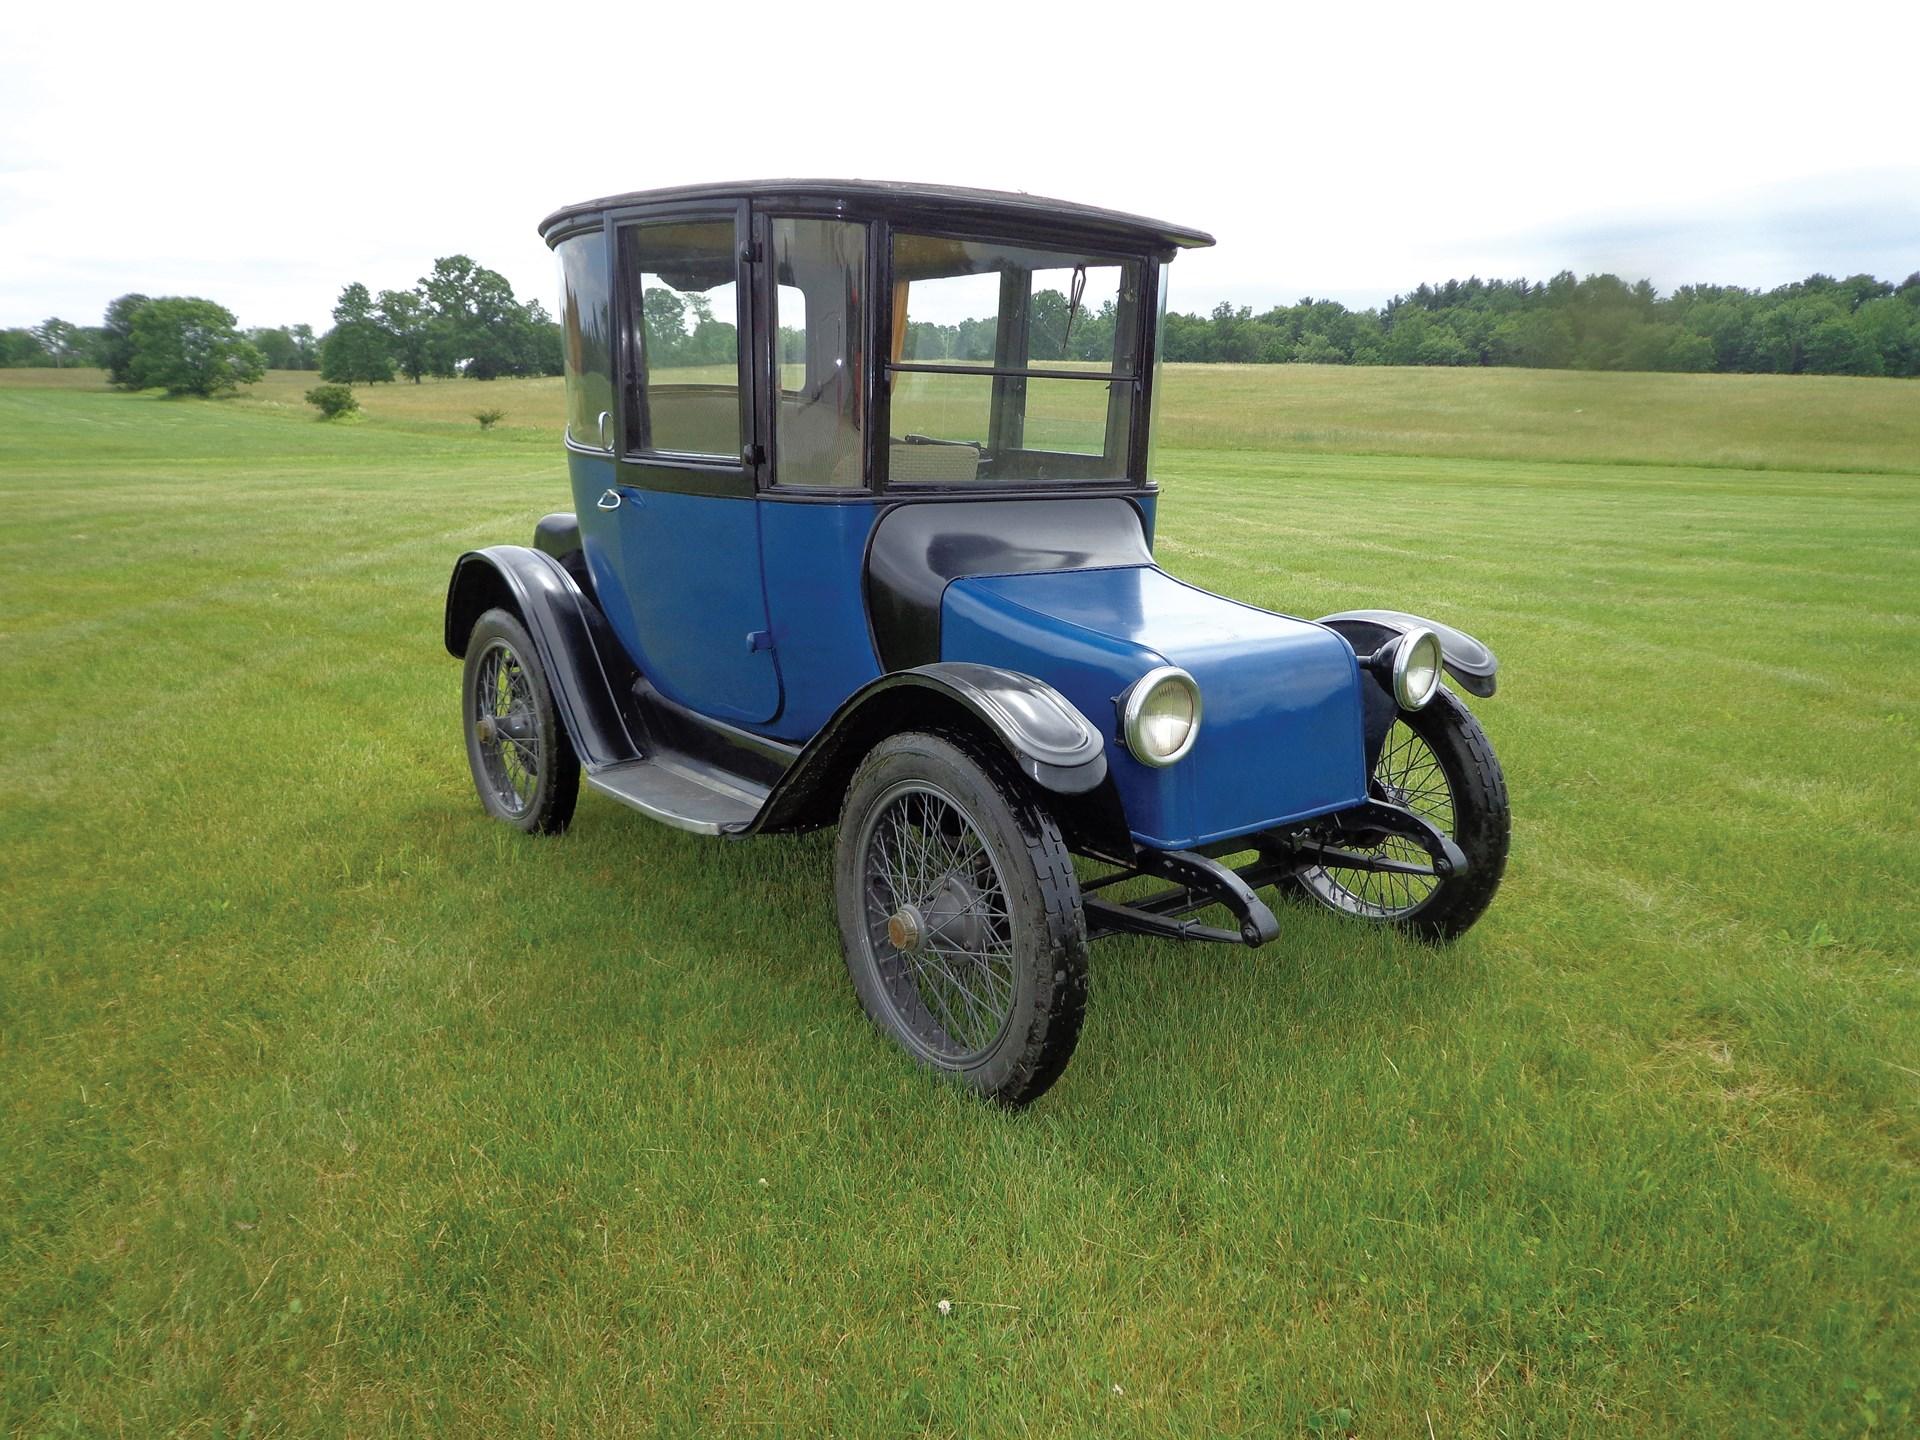 1919 Detroit Electric Model Type 19-B Four-Passenger Brougham